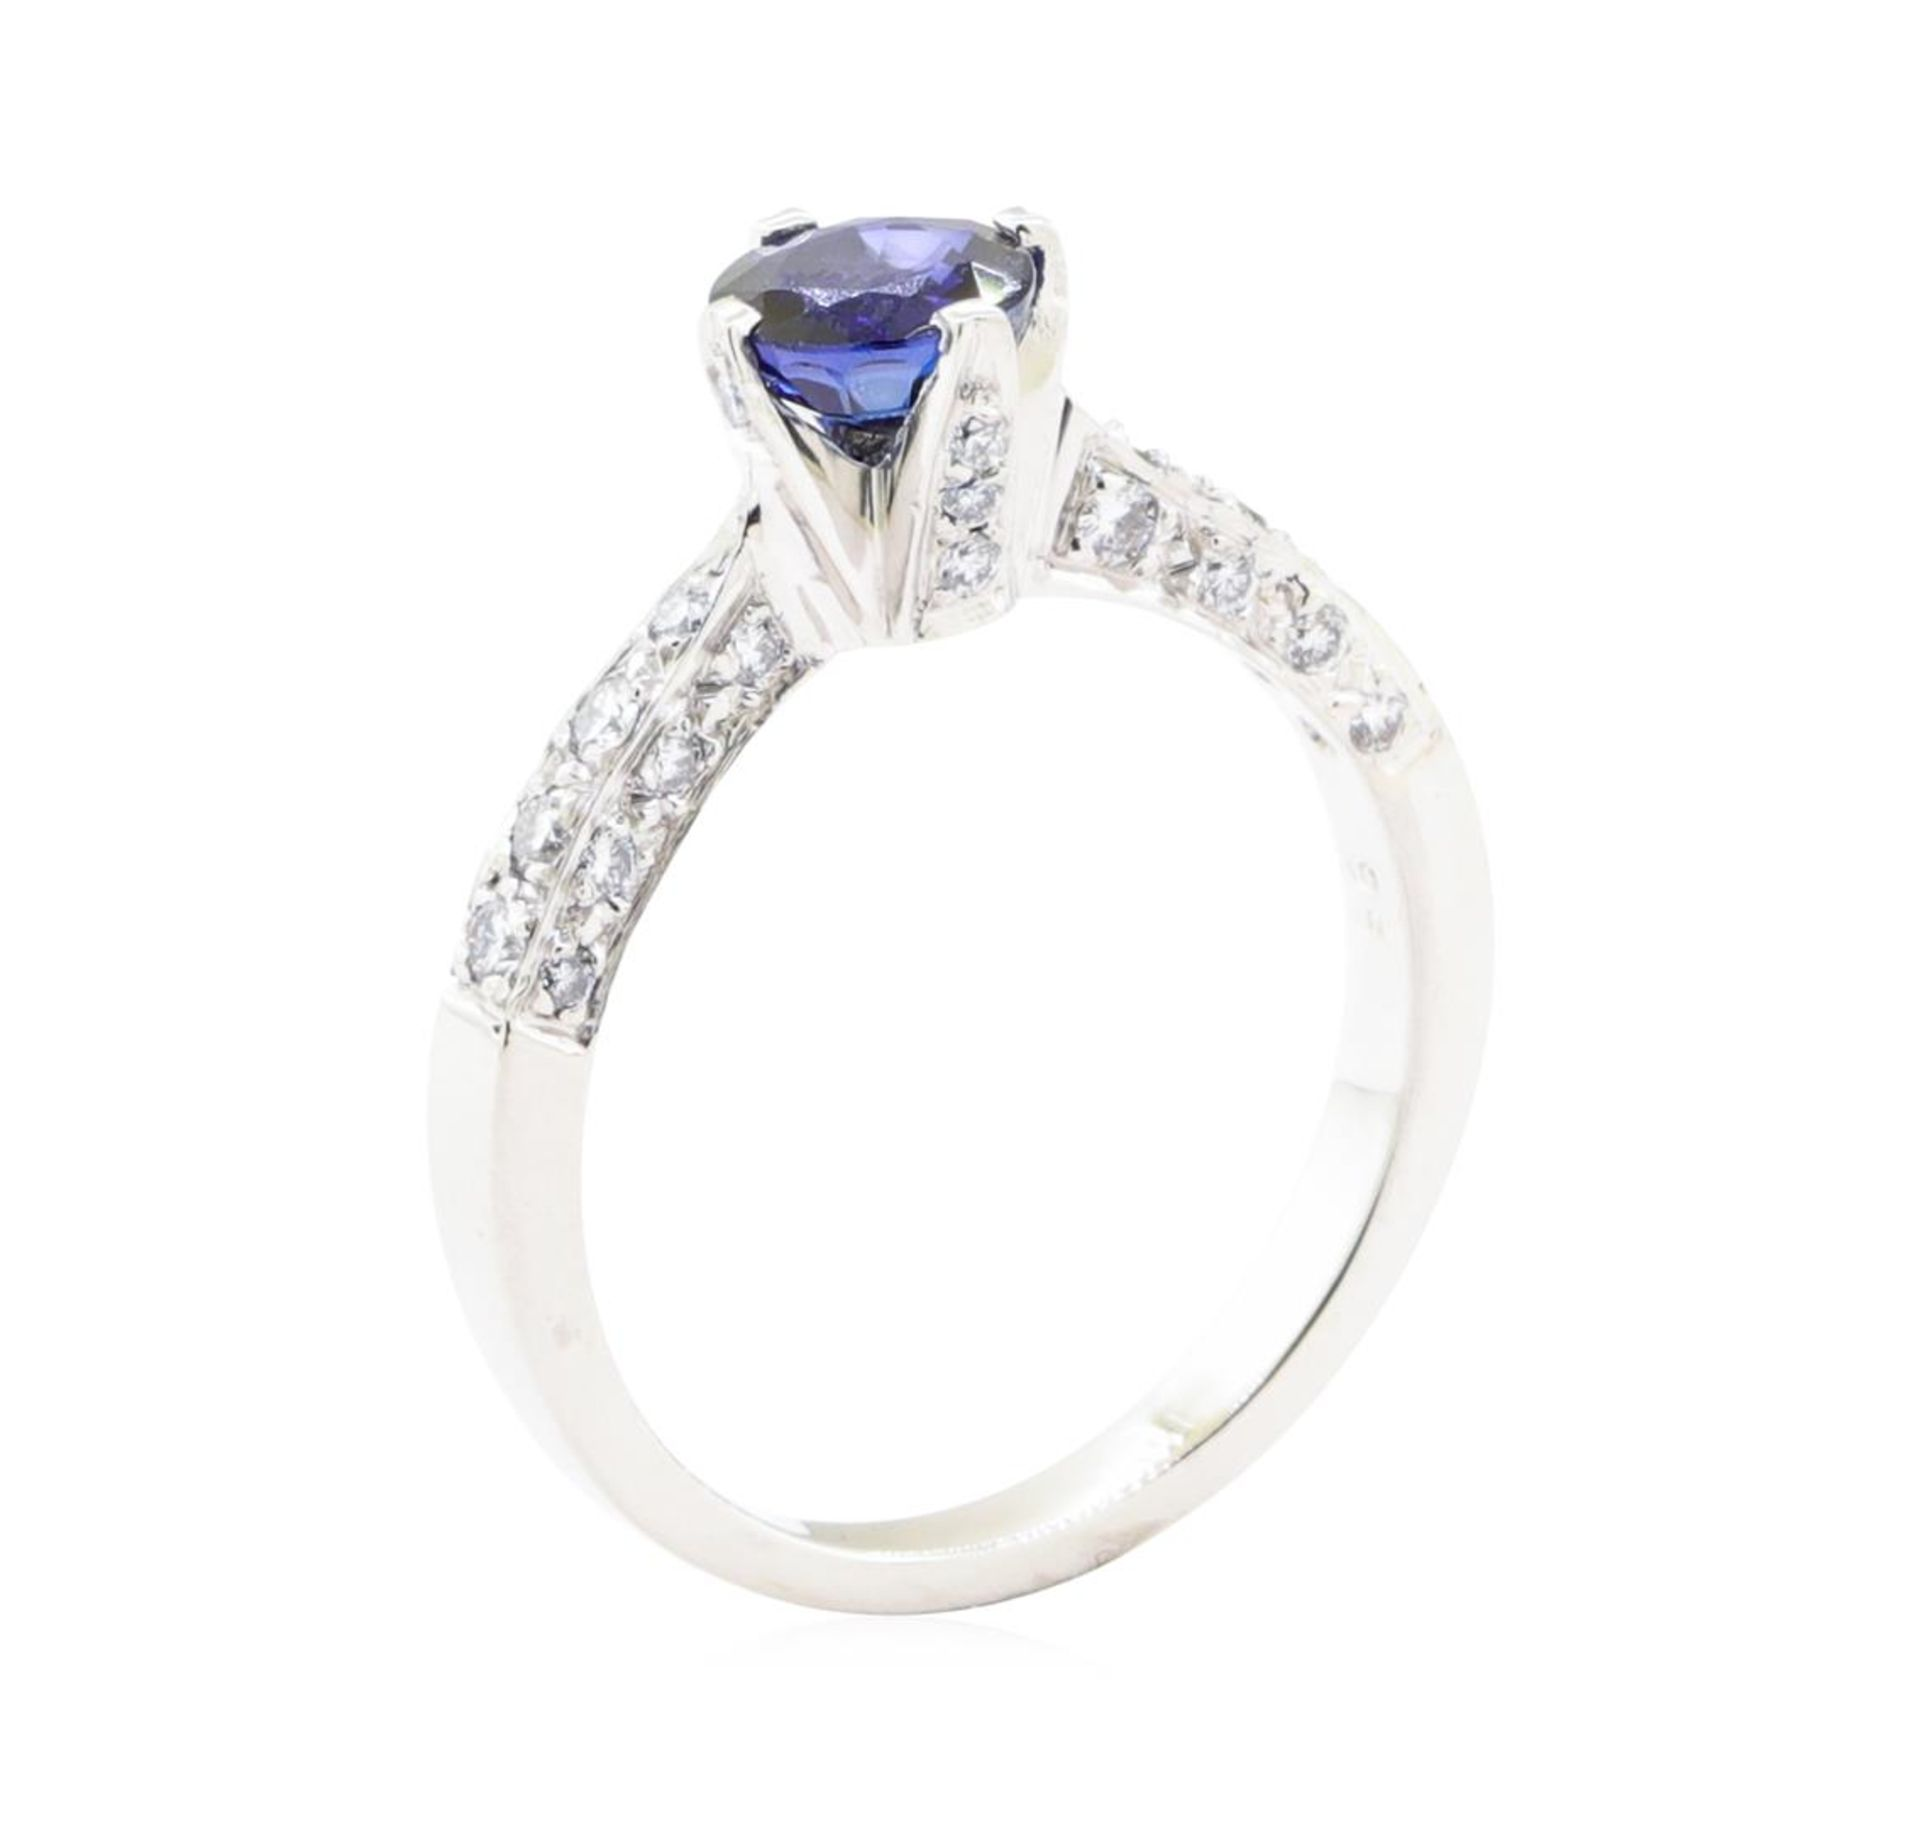 1.69 ctw Sapphire And Diamond Ring - Platinum - Image 4 of 5